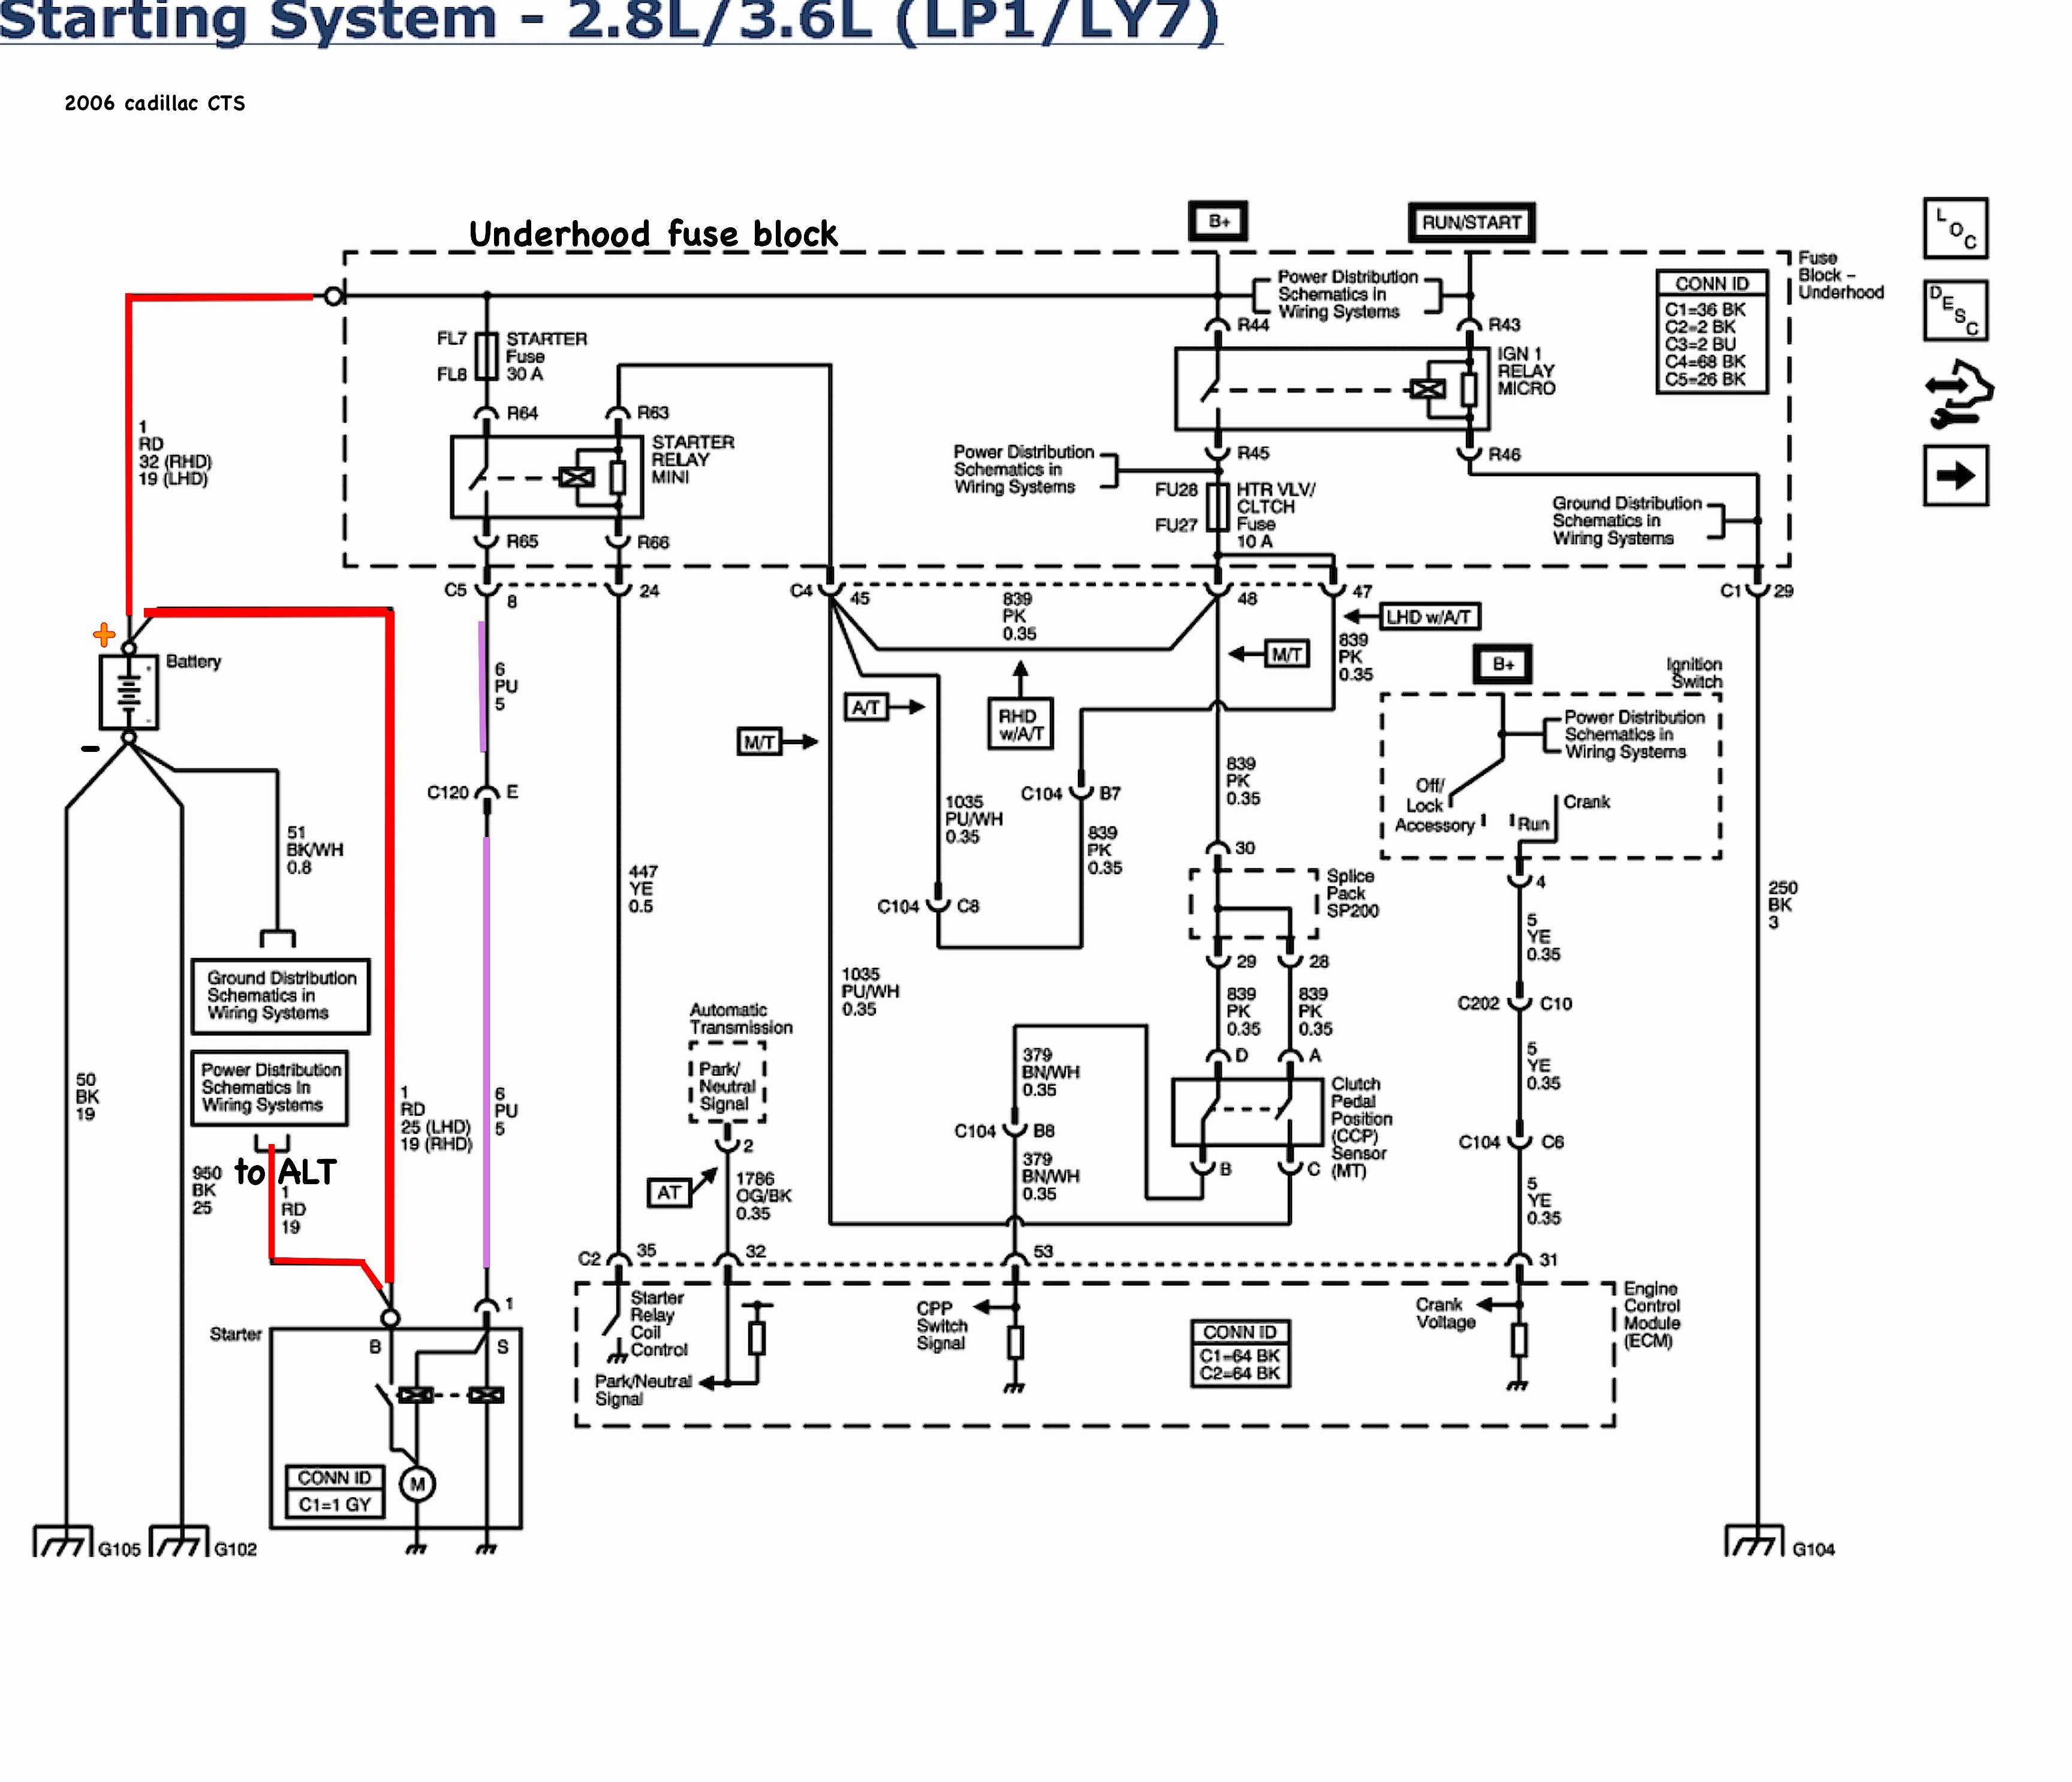 2011 Cadillac Srx Wiring Diagram Wiring Diagrams Doug Window Doug Window Massimocariello It